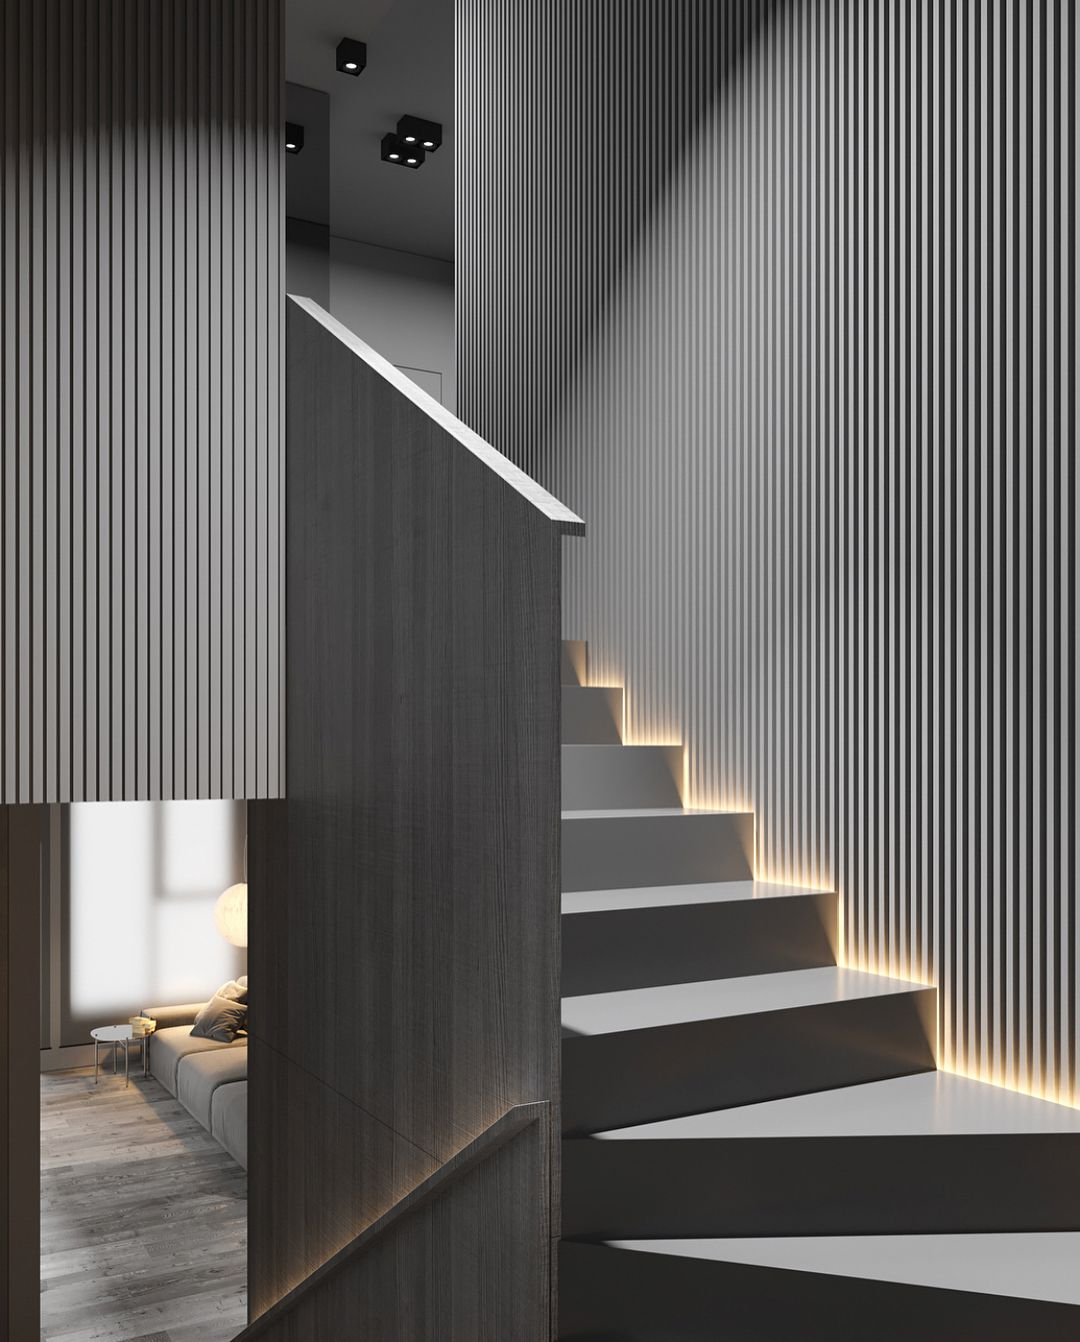 Stunning 23 Home Decor Z Best Interior Design Computer Software Season Archiproducts Dekorasilamaran Transitional Home Decor Home Decor Home Design Decor